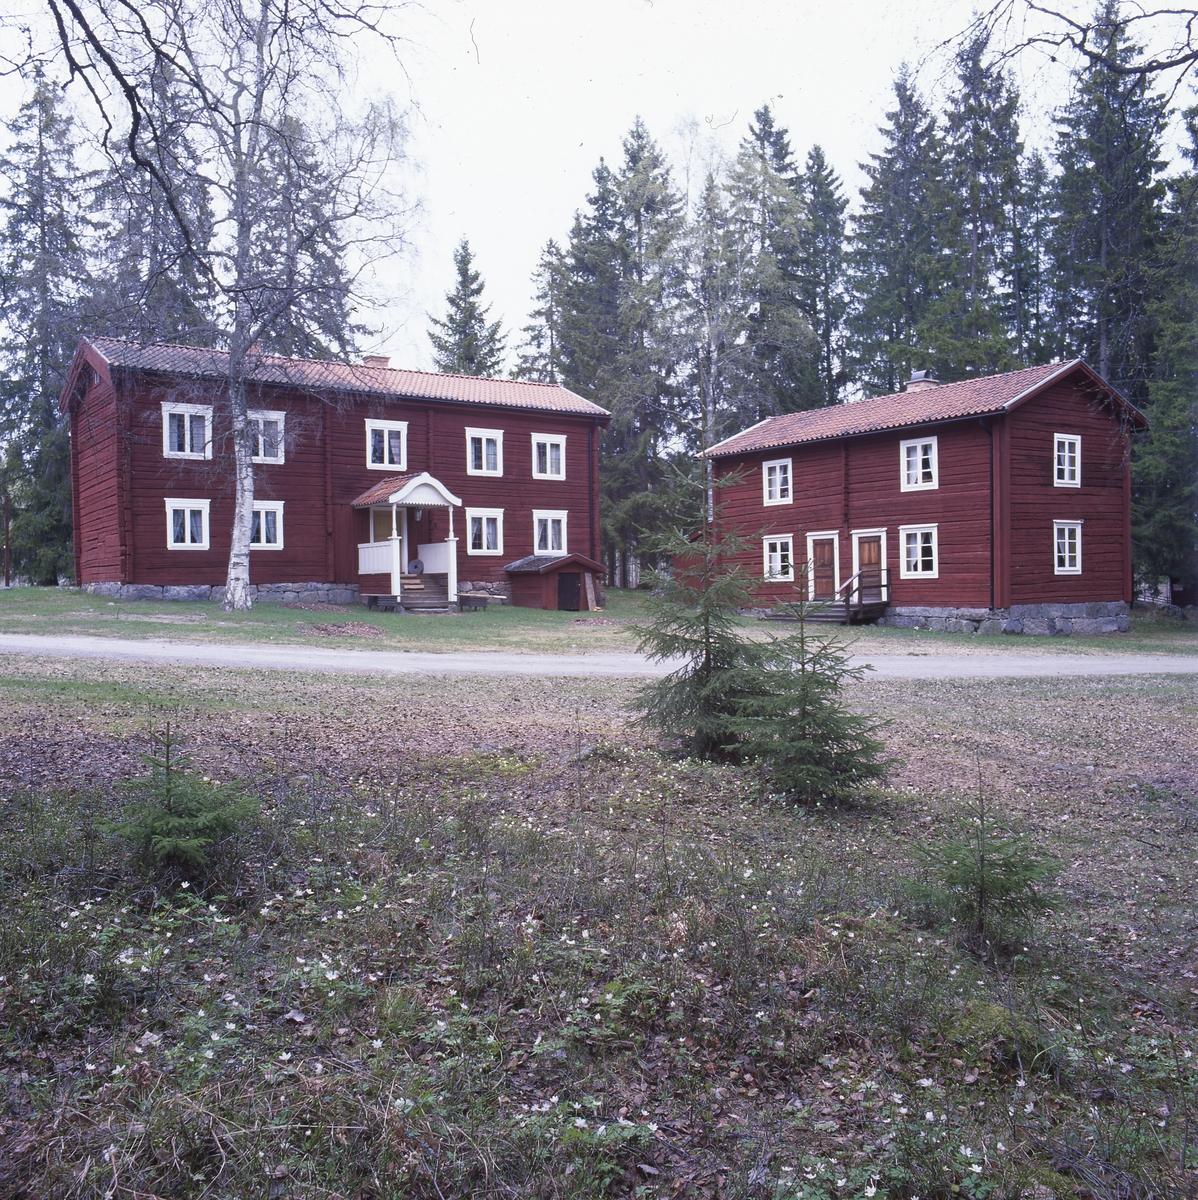 7 results in Hlsinglands Museum - DigitaltMuseum